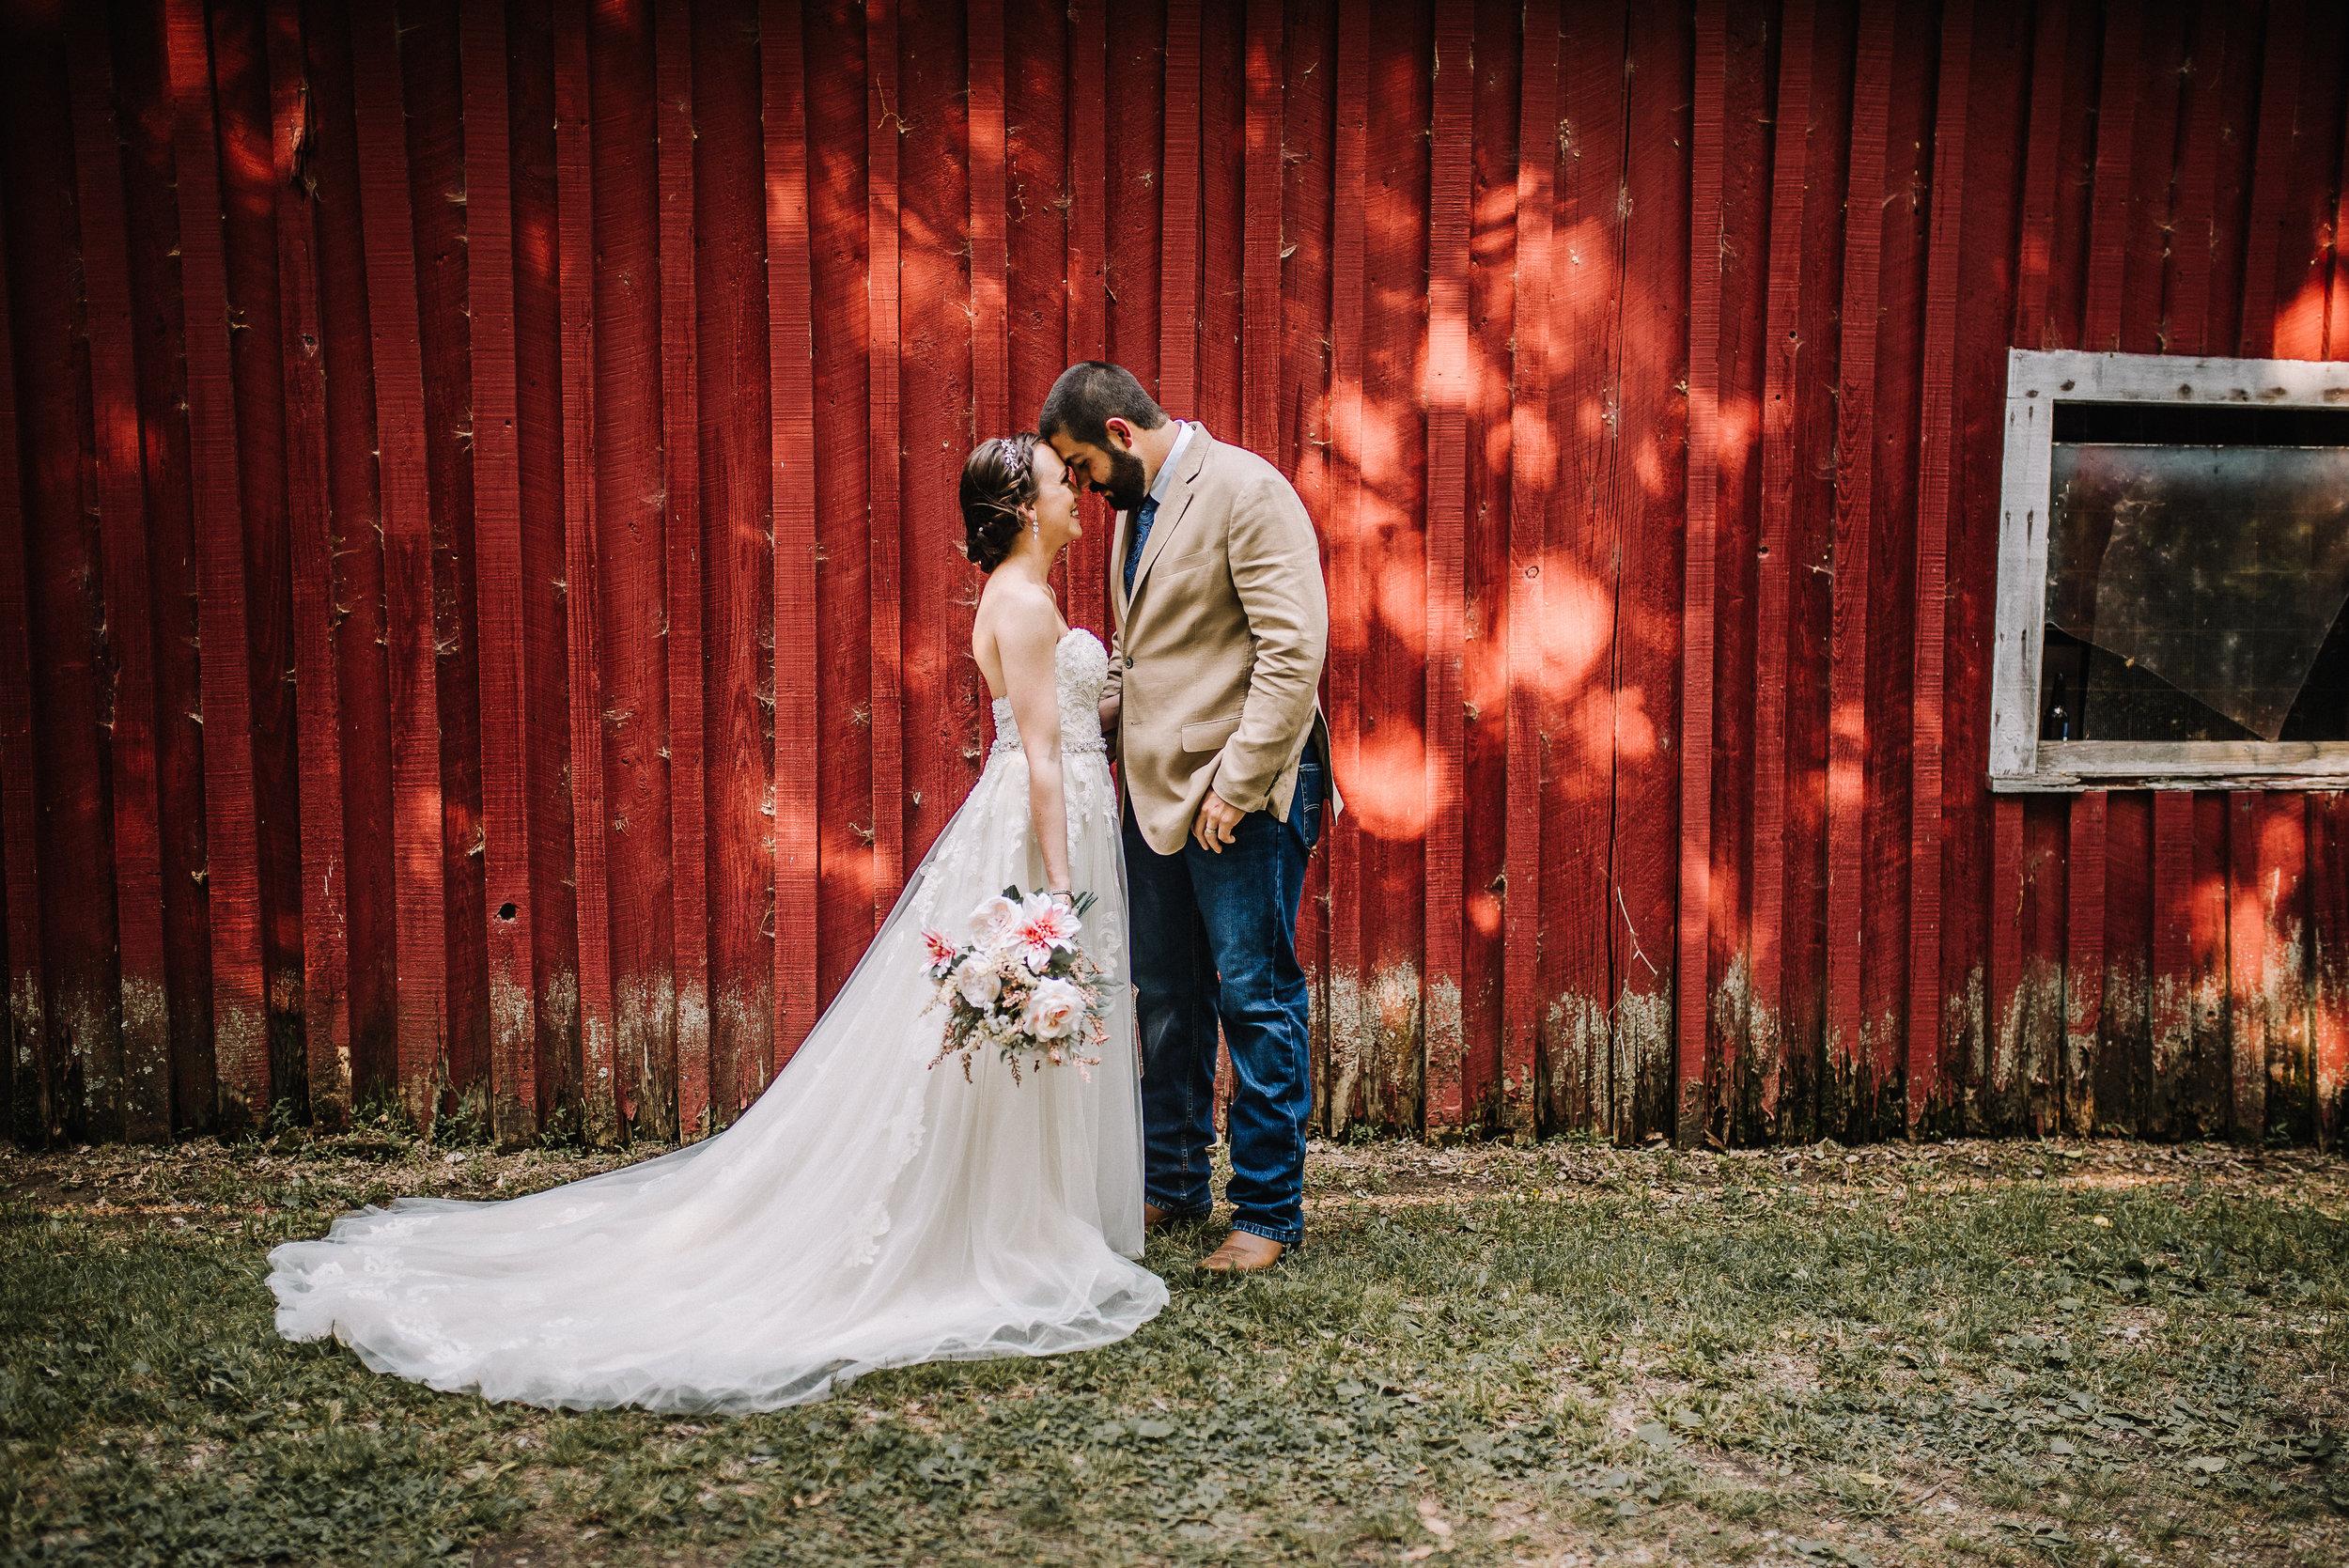 Rustic_Wedding_Memphis_Ashley-Benham-Photography-1.jpg